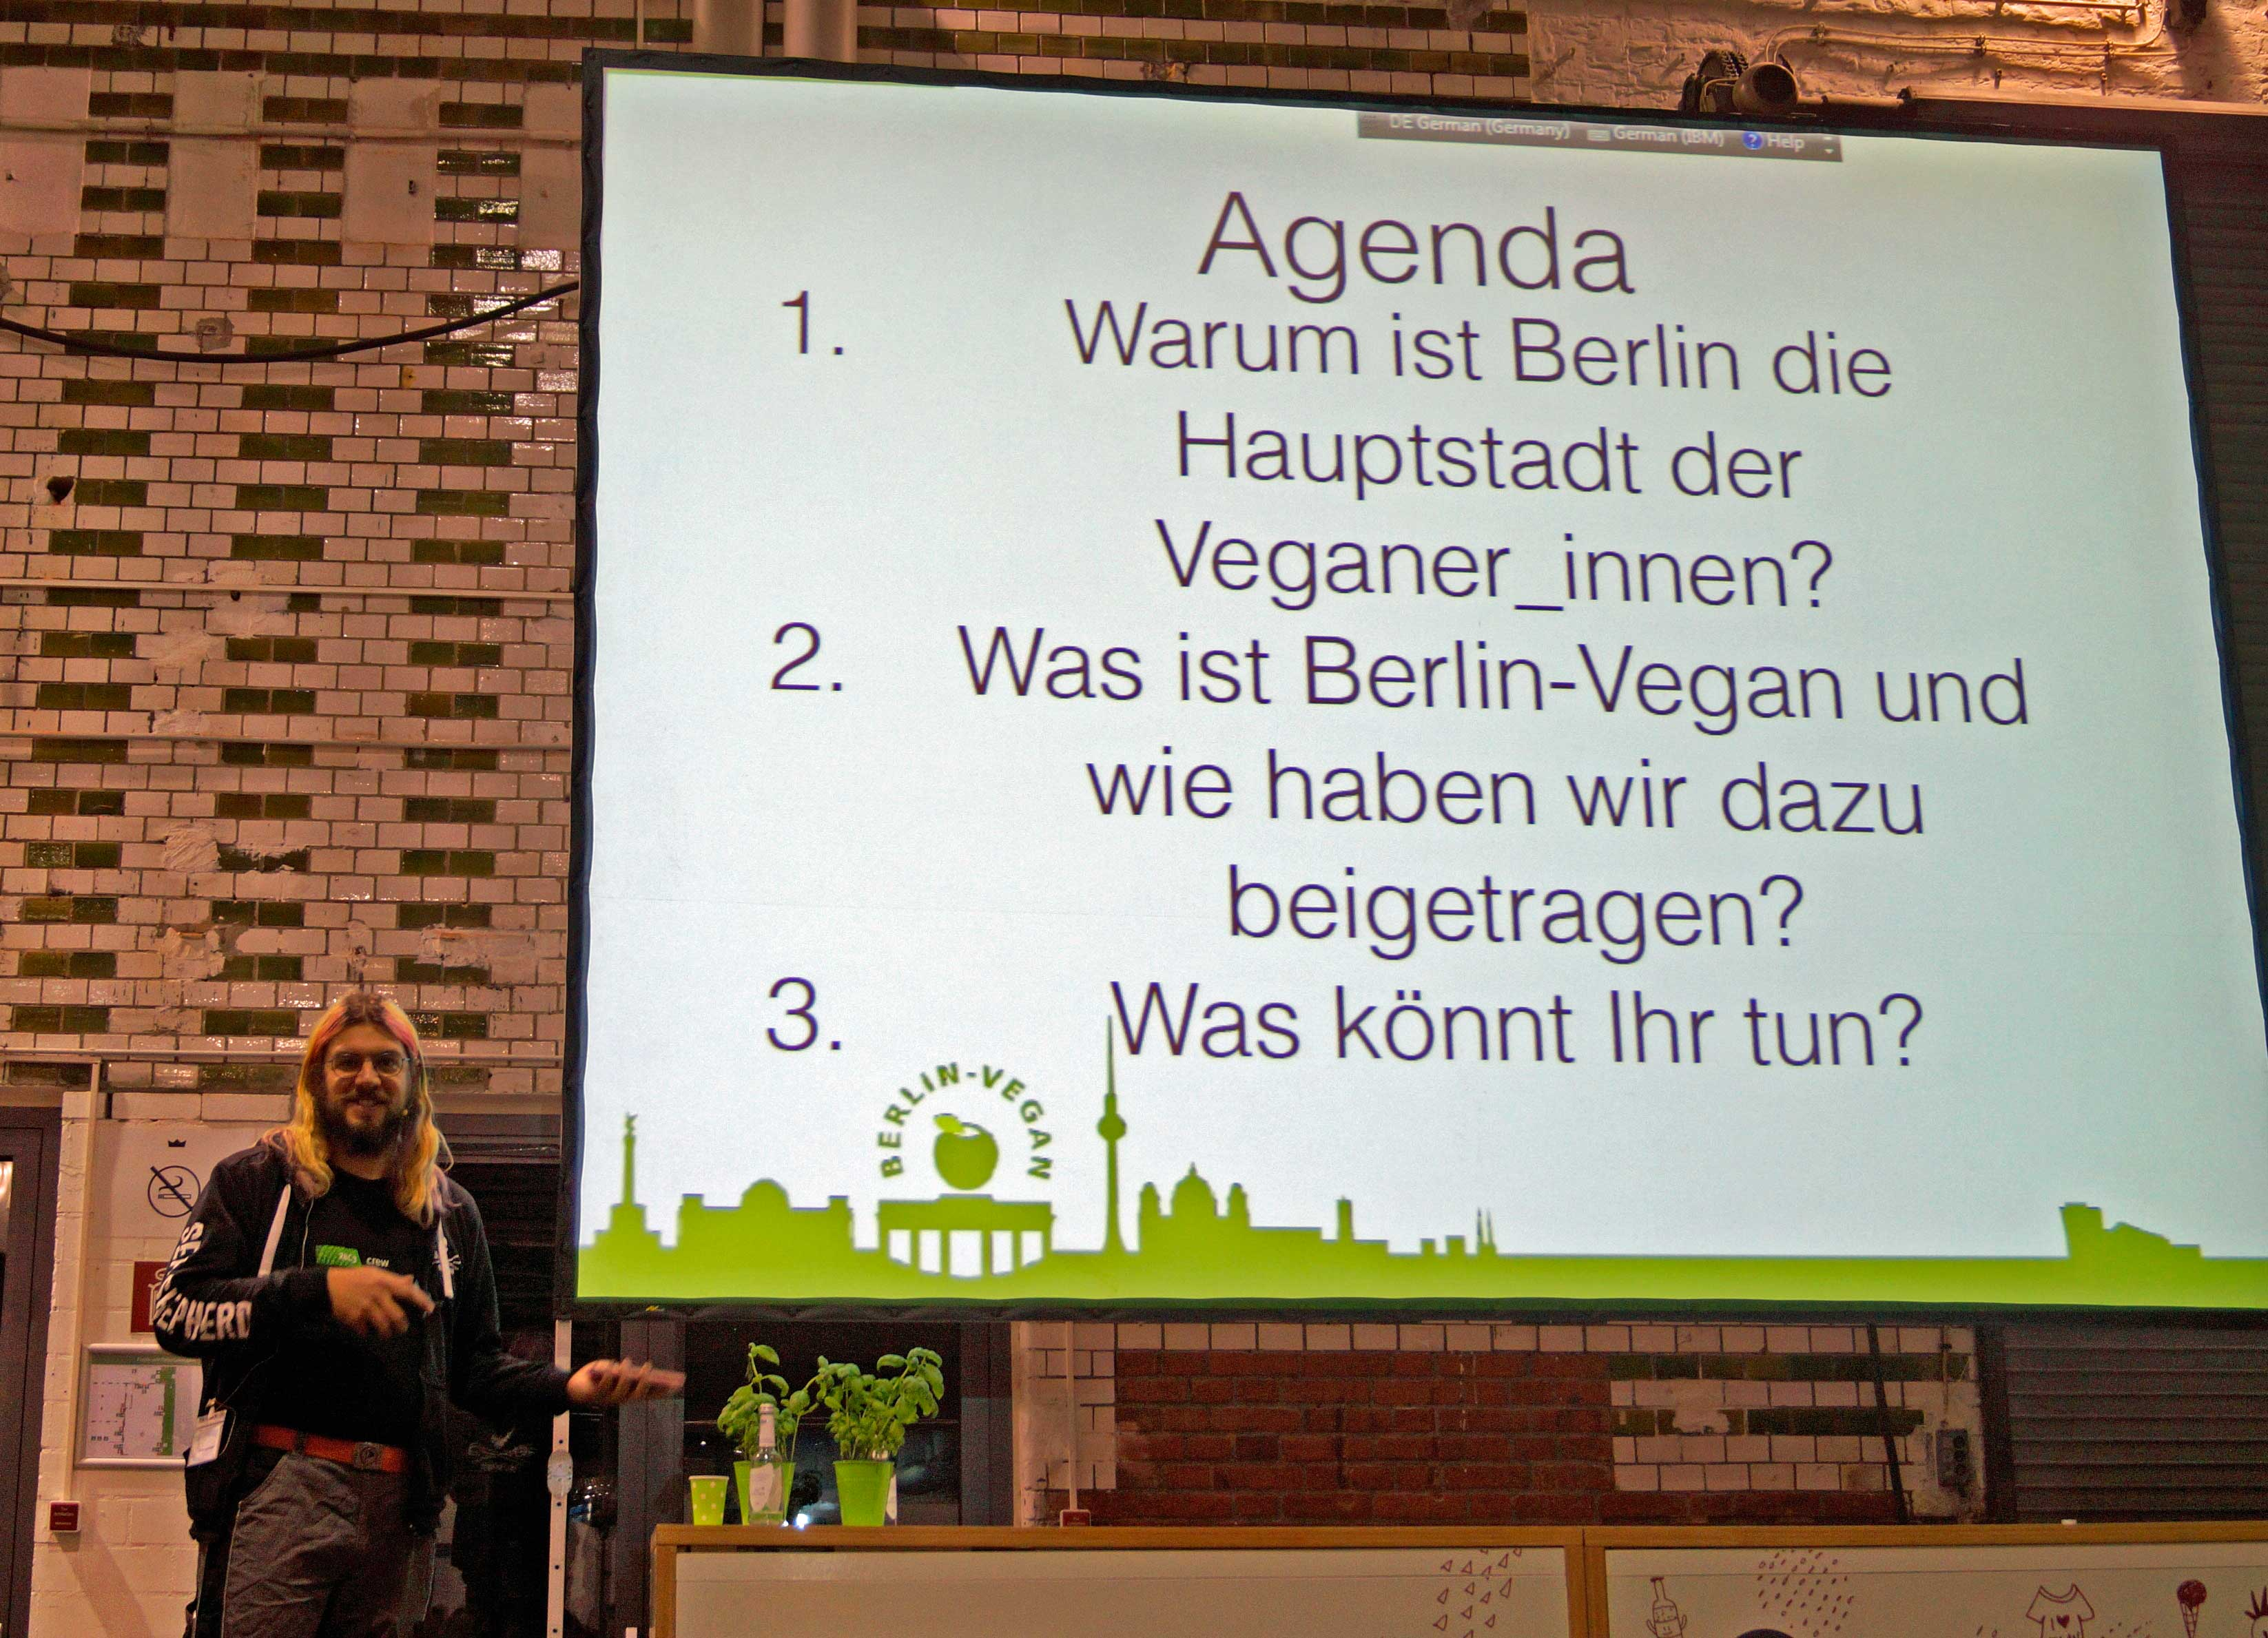 berlin-vegan auf der veggieworld 2016 | berlin-vegan